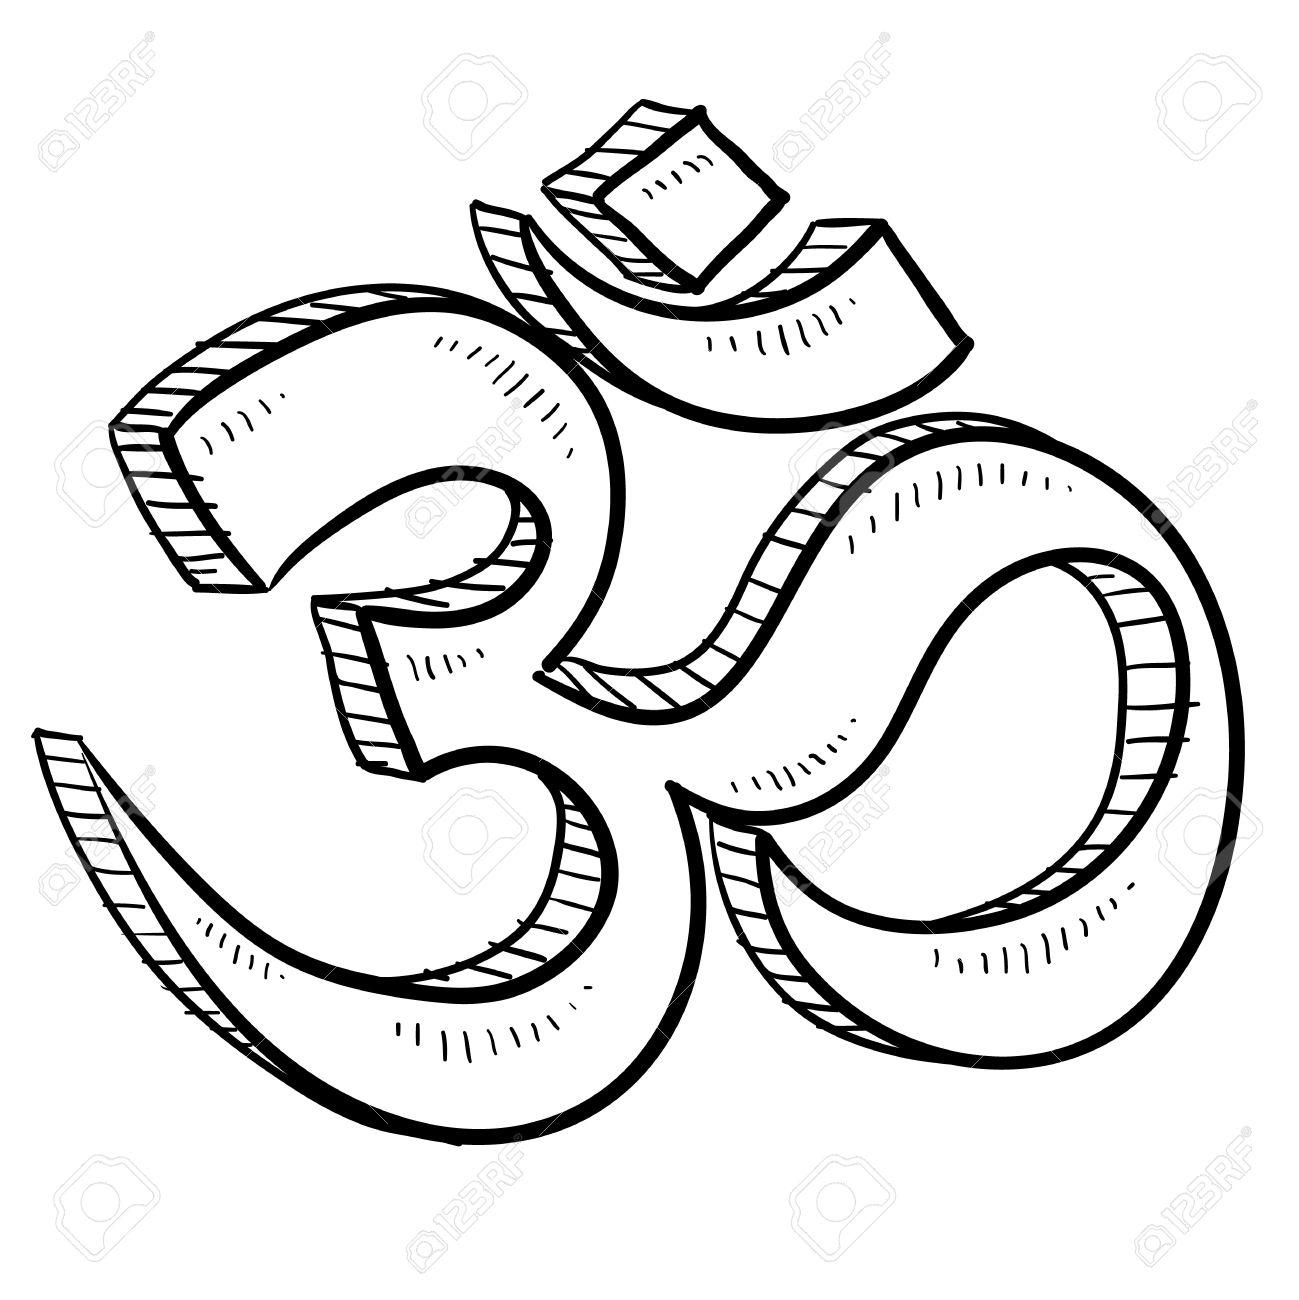 free yoga symbols clip art - photo #48